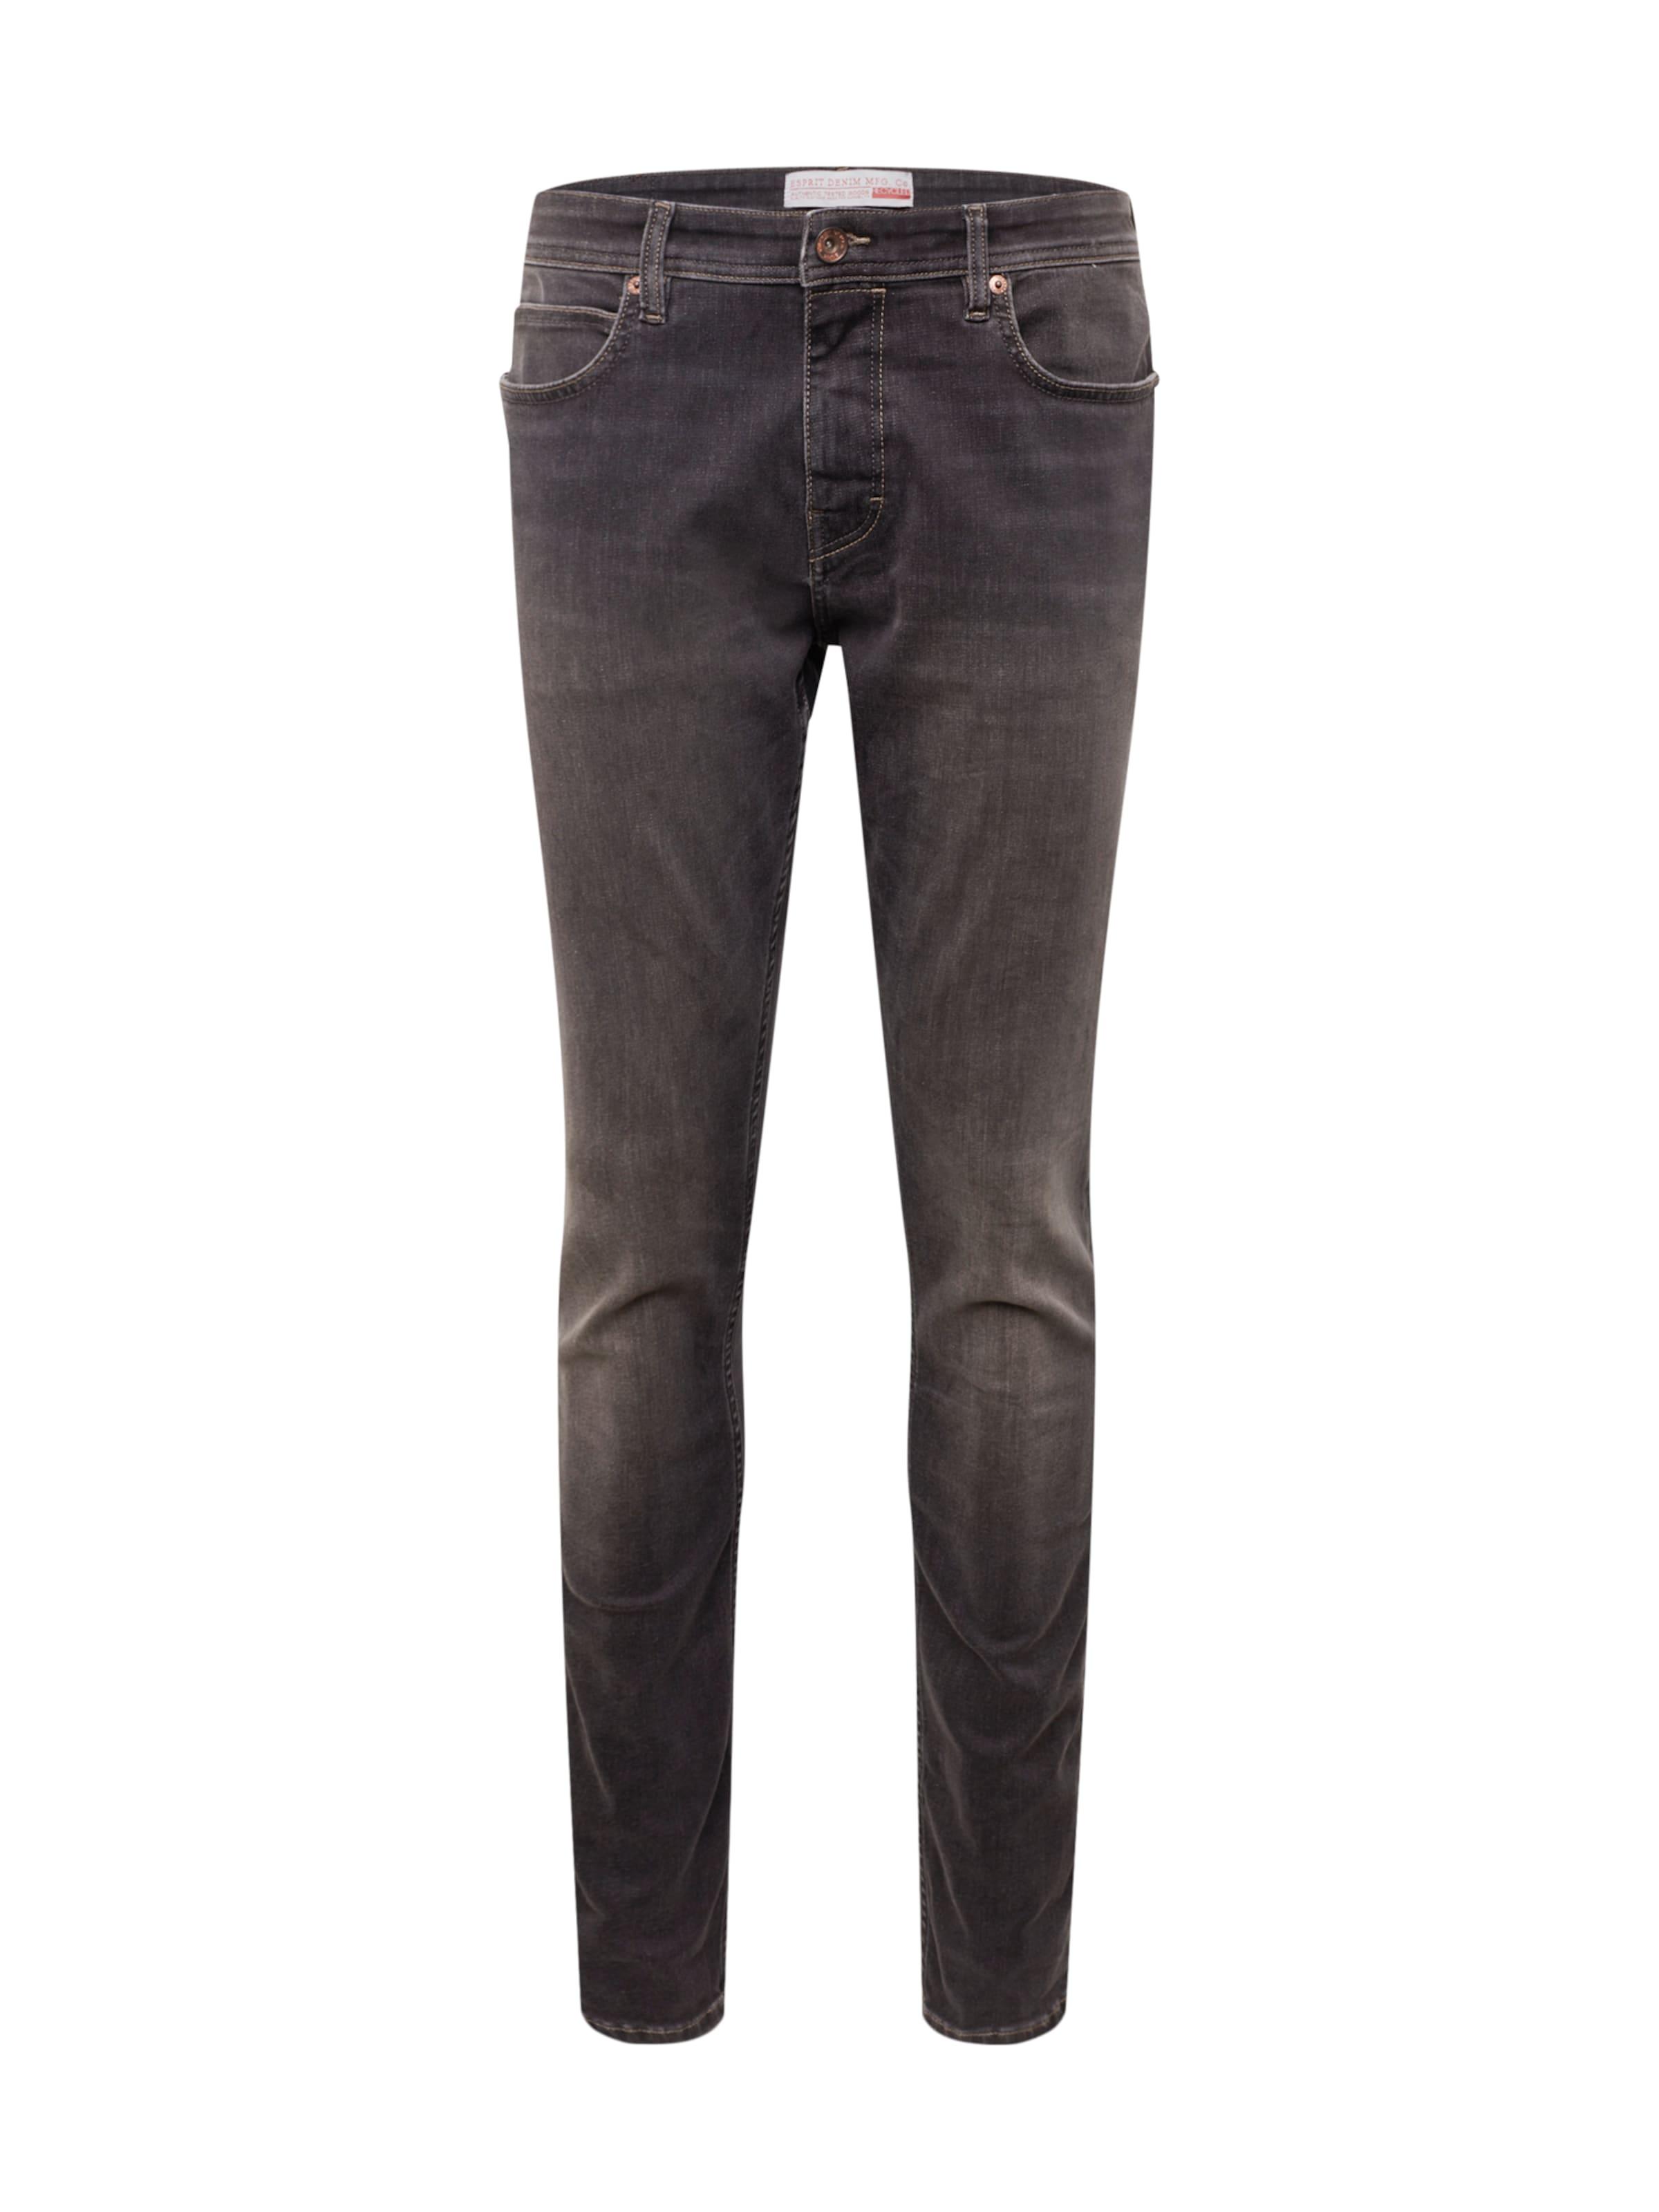 Gris Slim Pants' Denim Esprit 'rcs En Jean Dynami O80knwP